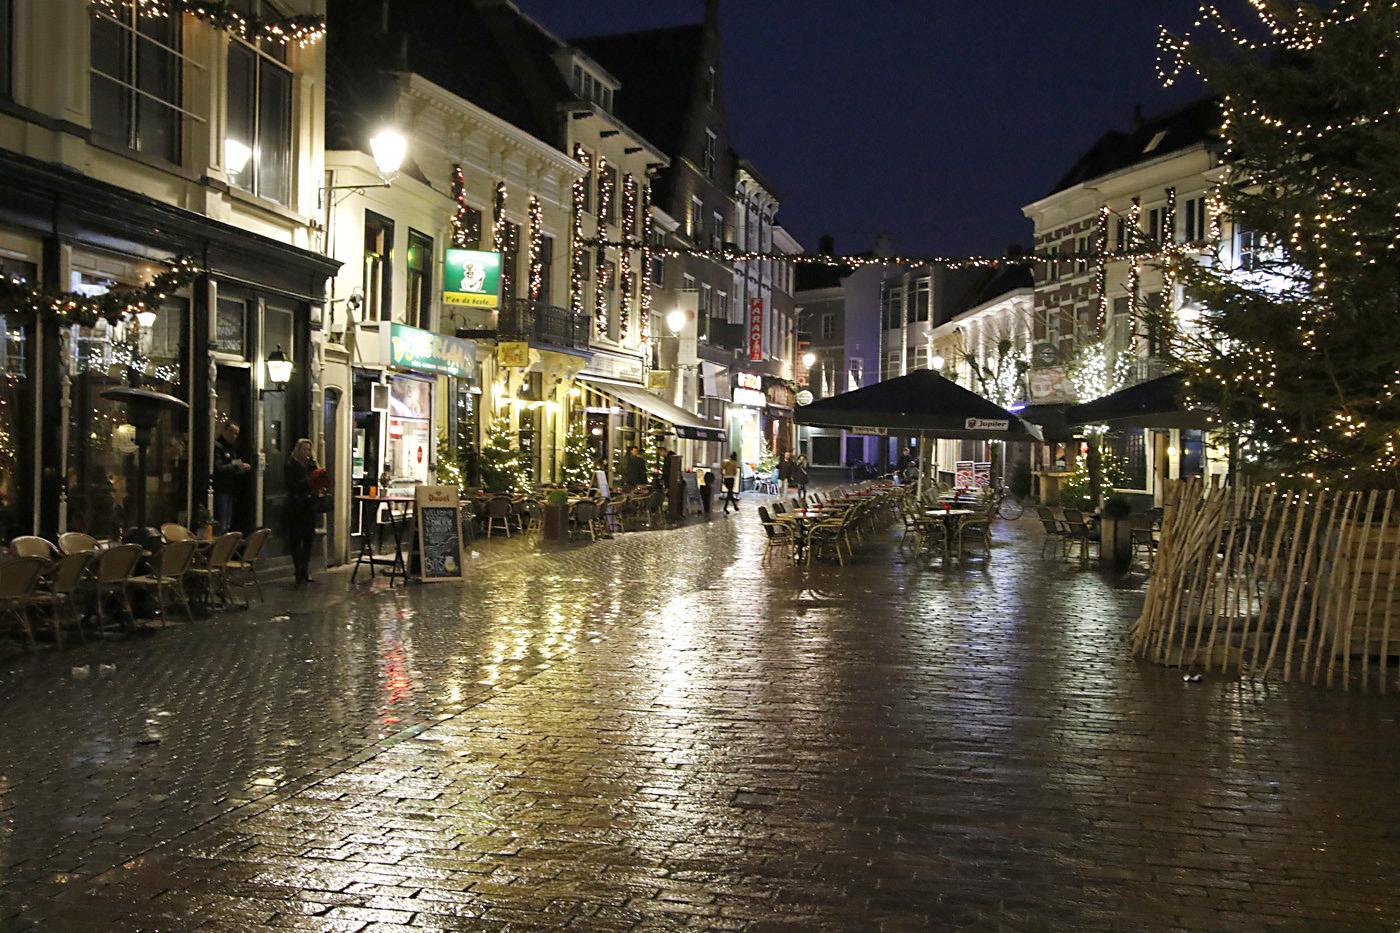 Breda in de nacht, januari 2016.